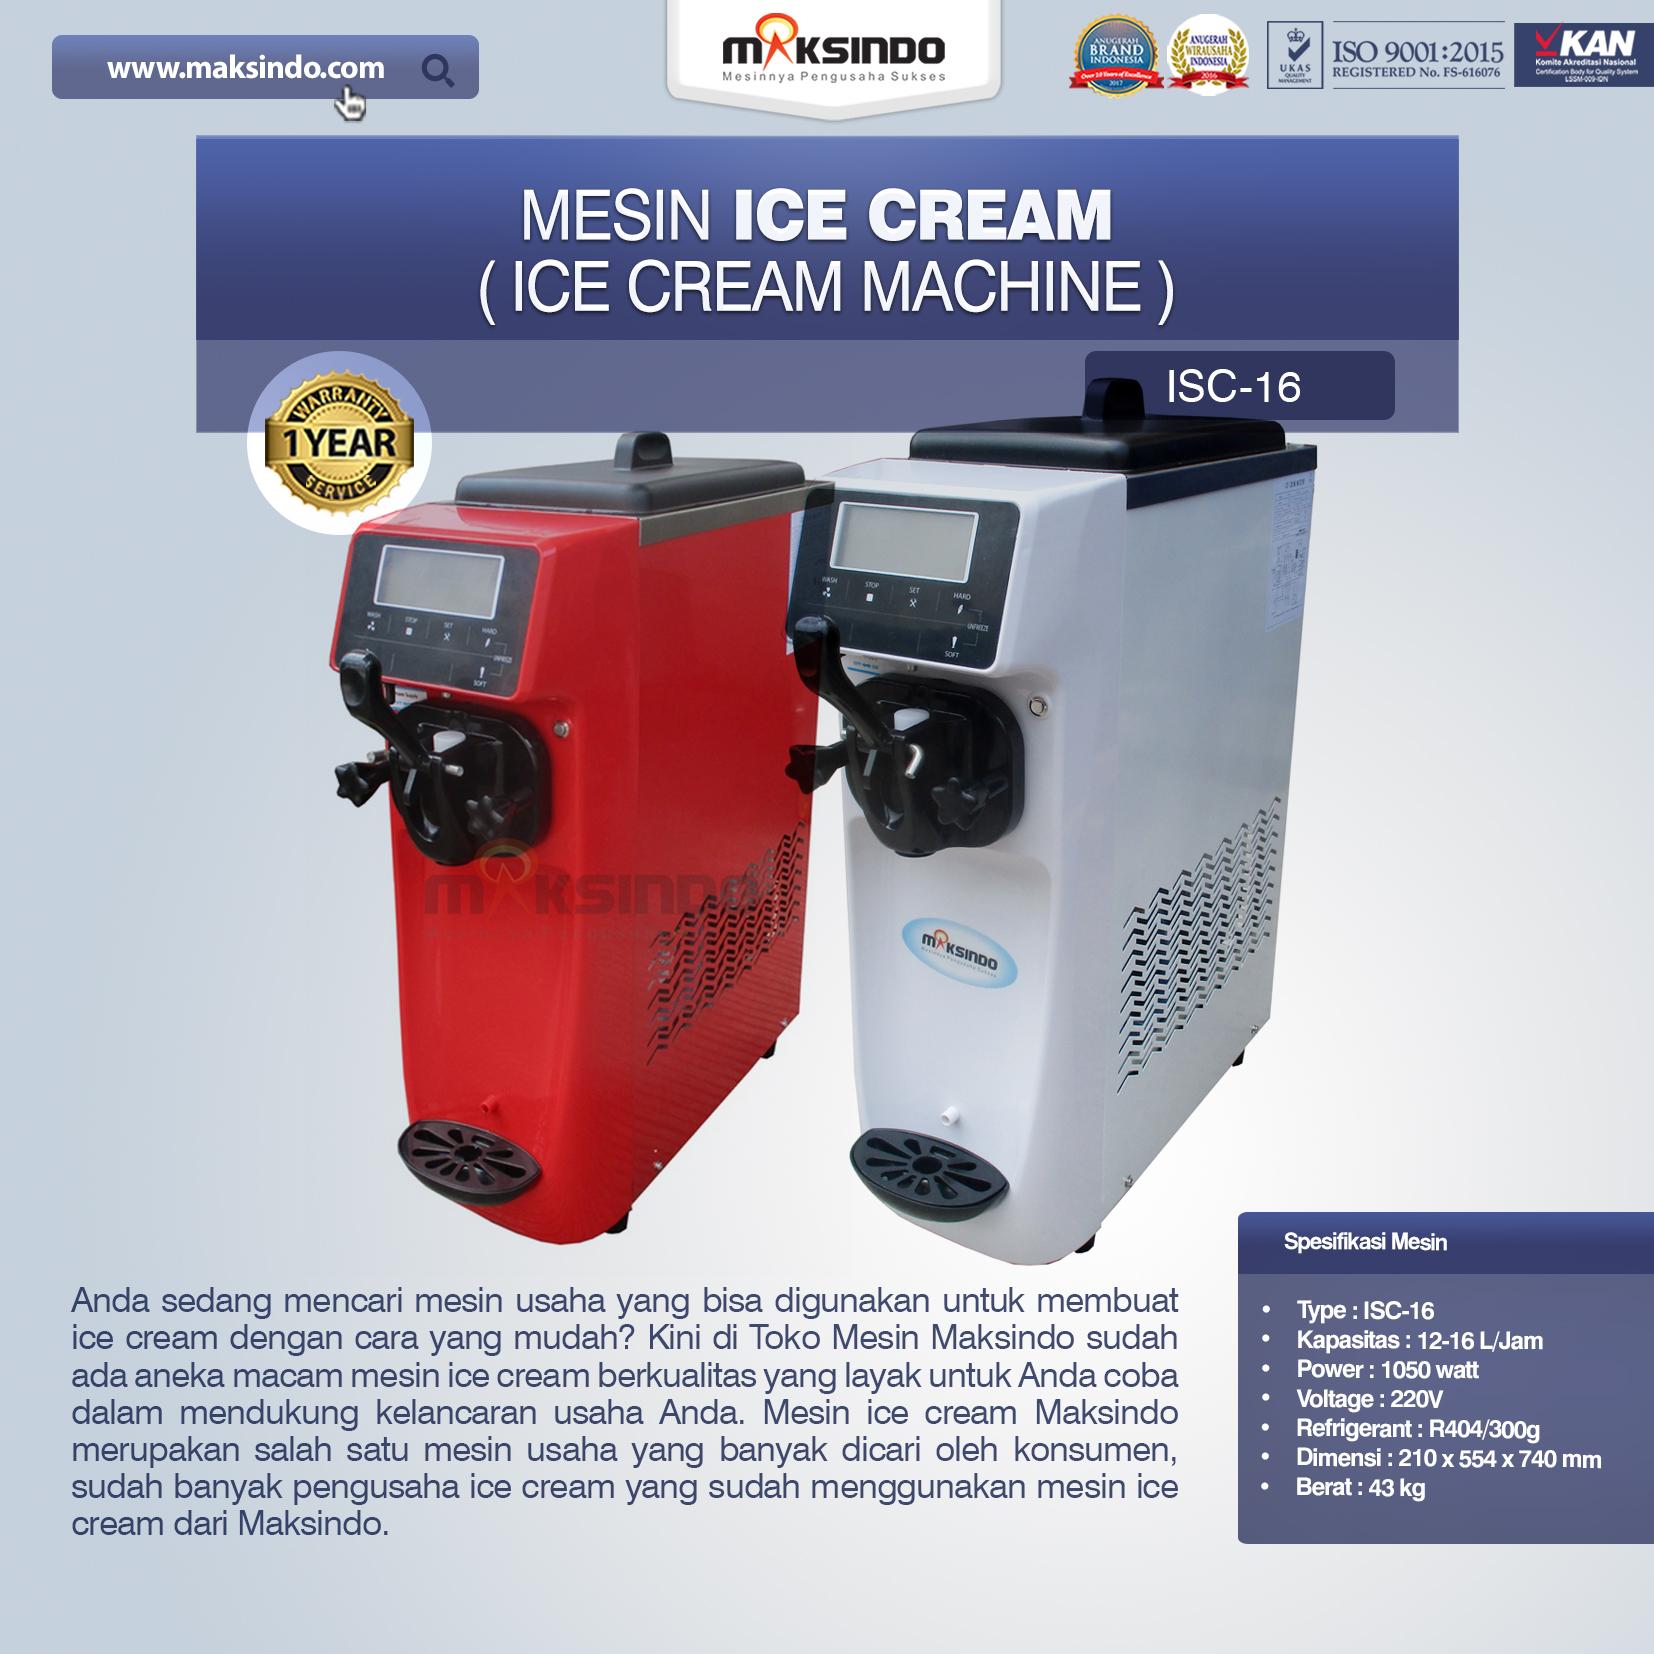 Jual Mesin Es Krim (Ice Cream Machine) ISC-16 di Bali